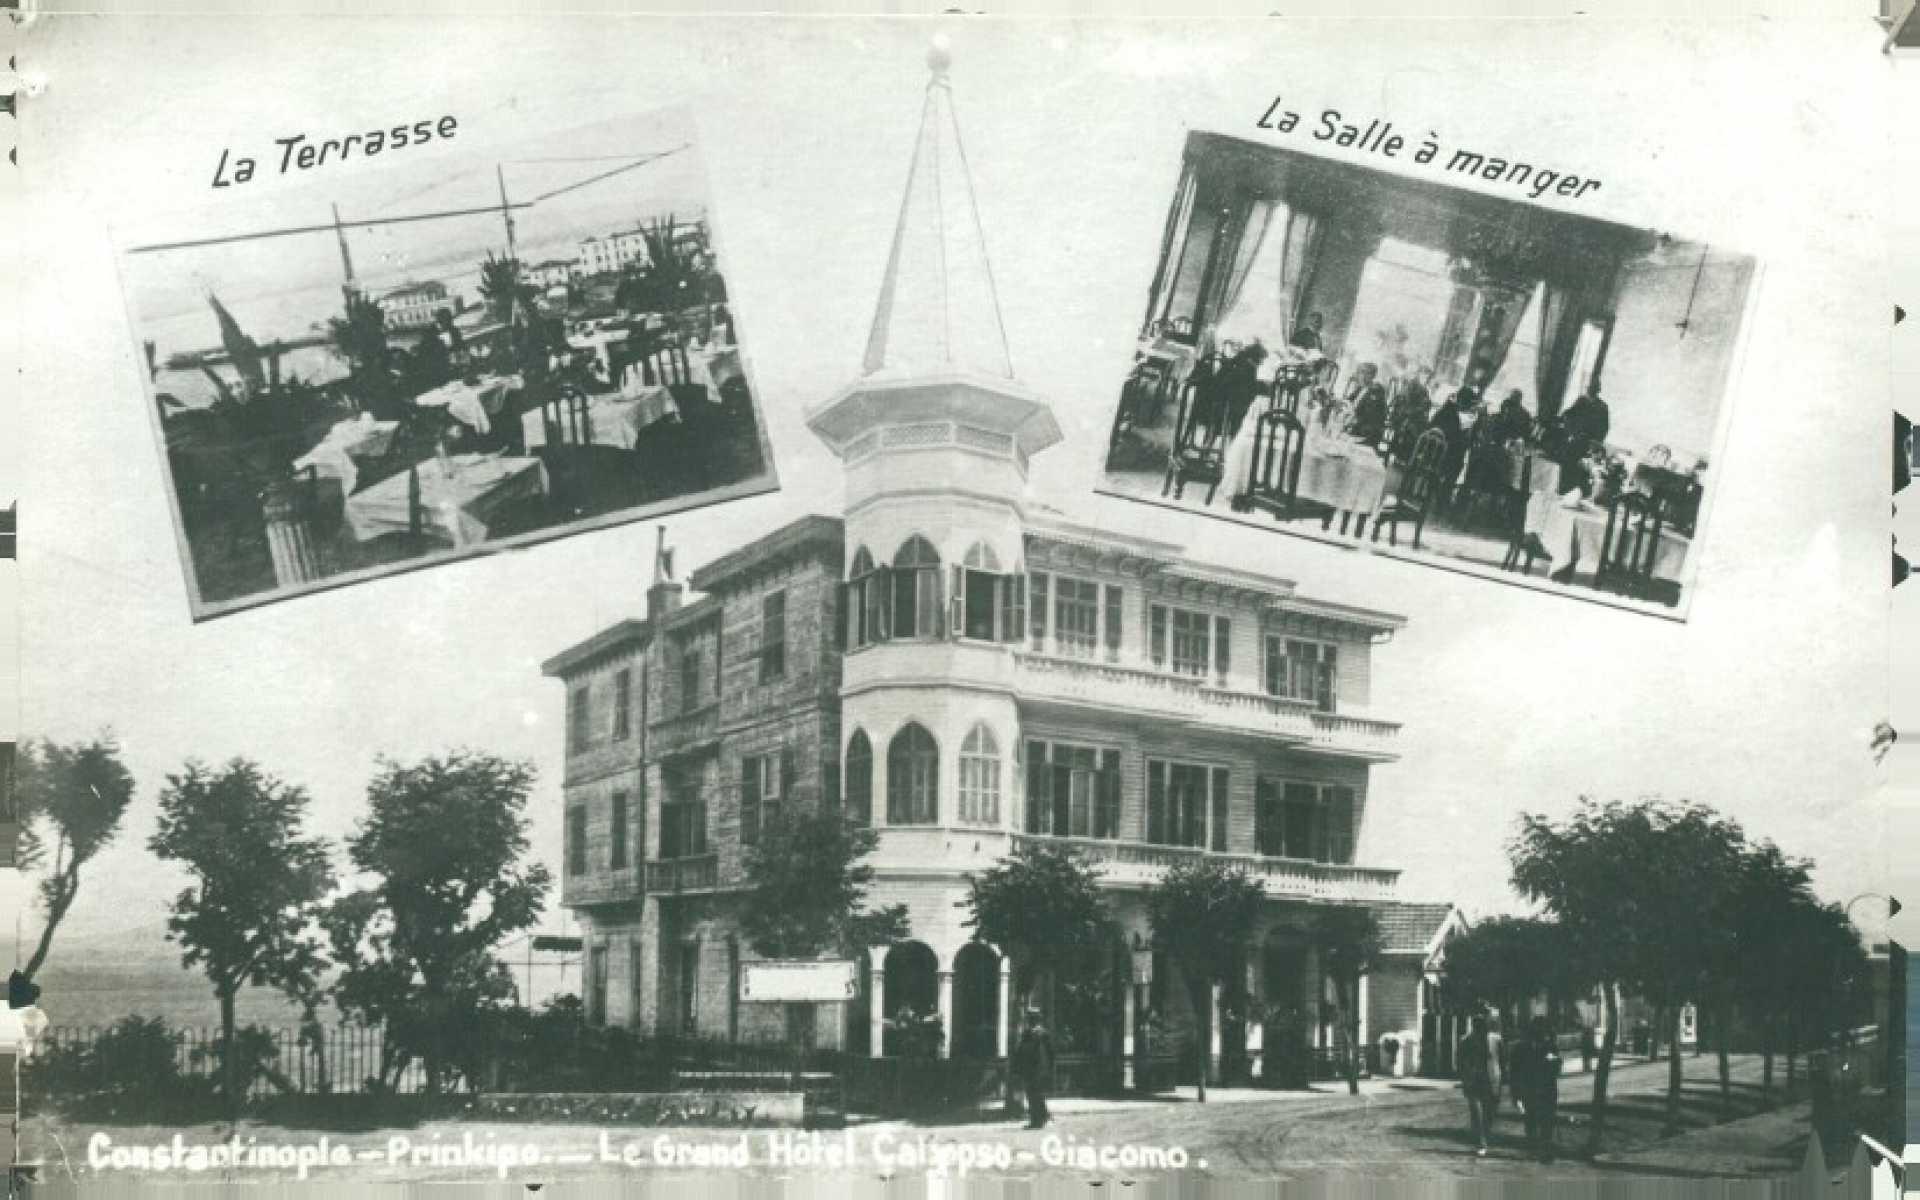 Constantinople- Prinkipo- Le Grand Hotel Calypso Giacomo. La Terrase  La Salle a manger